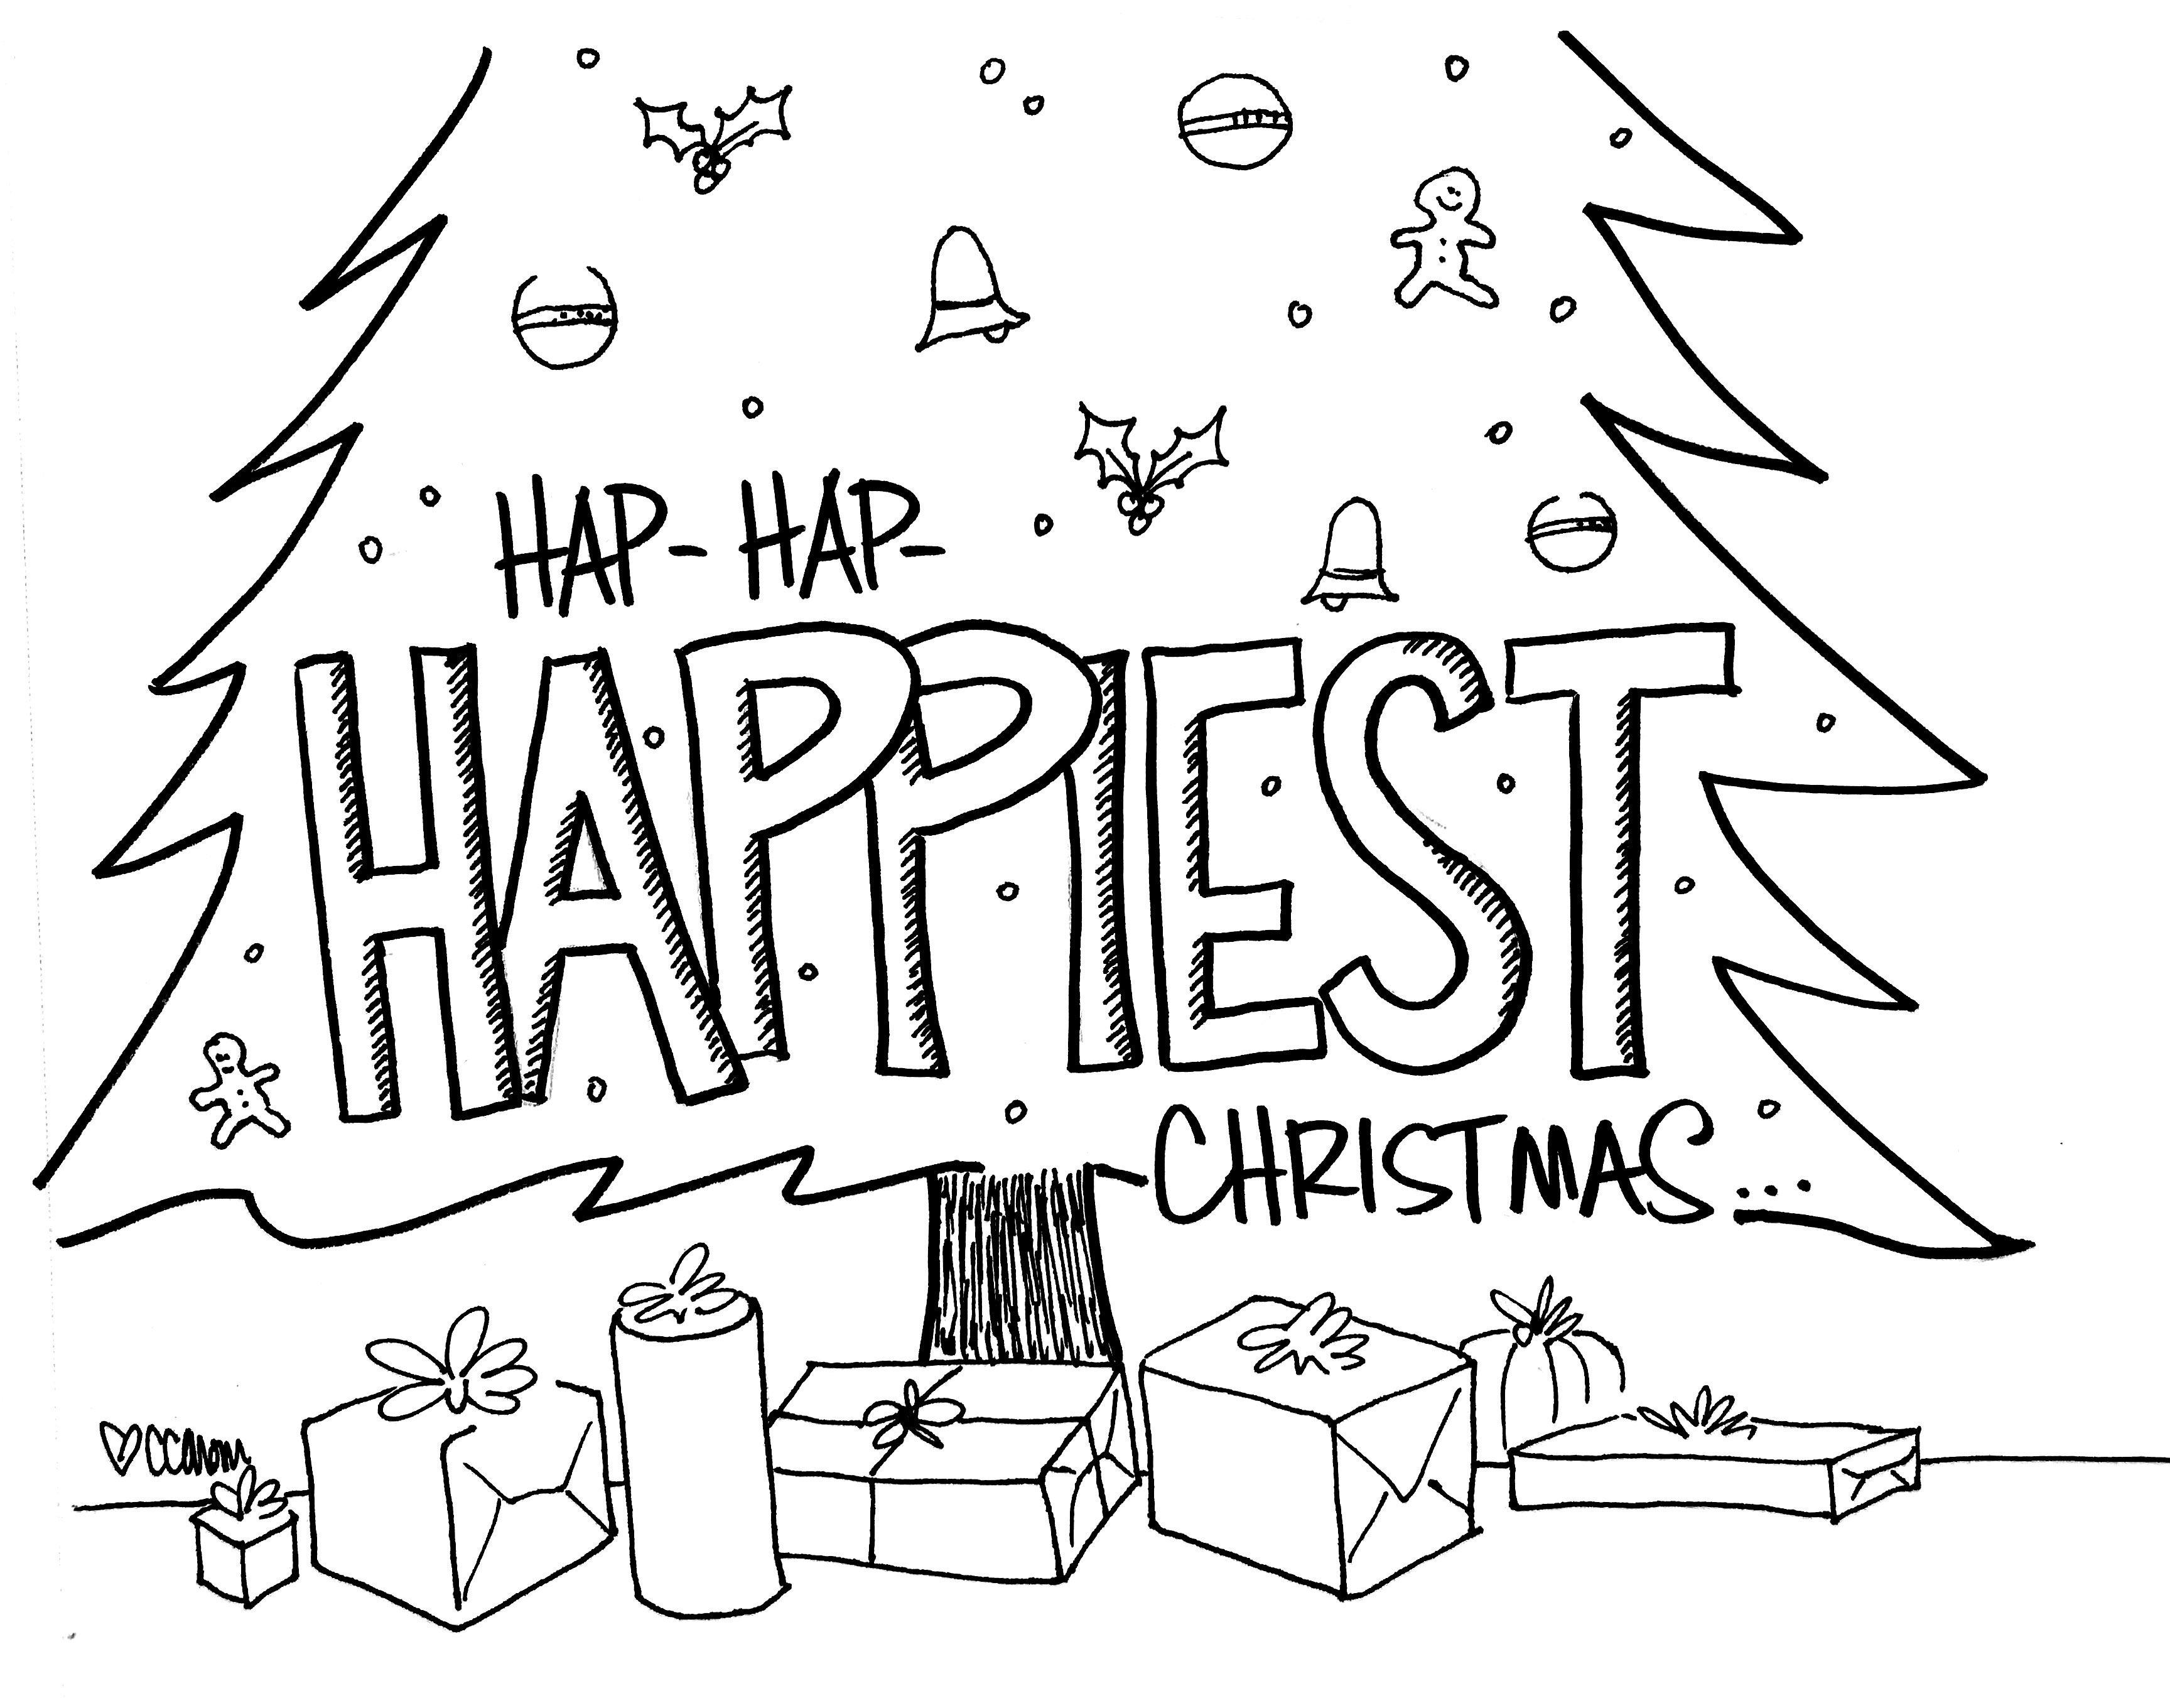 Hap Hap Happiest Christmas